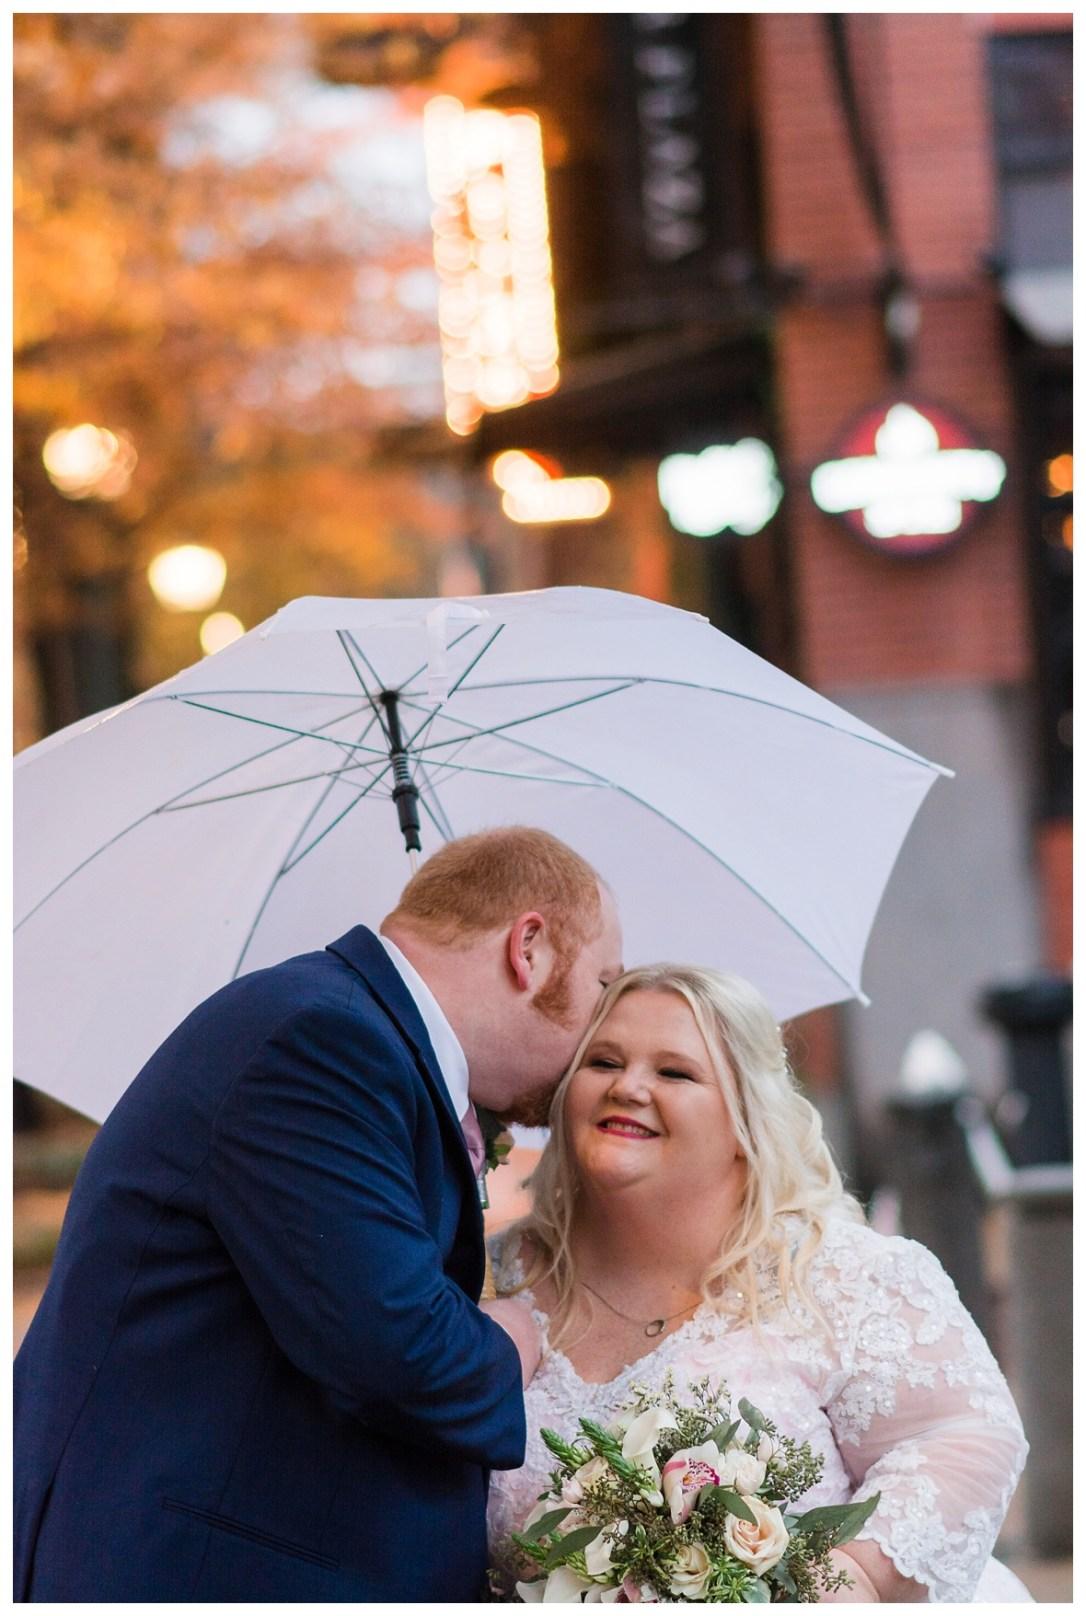 white umbrella for wedding